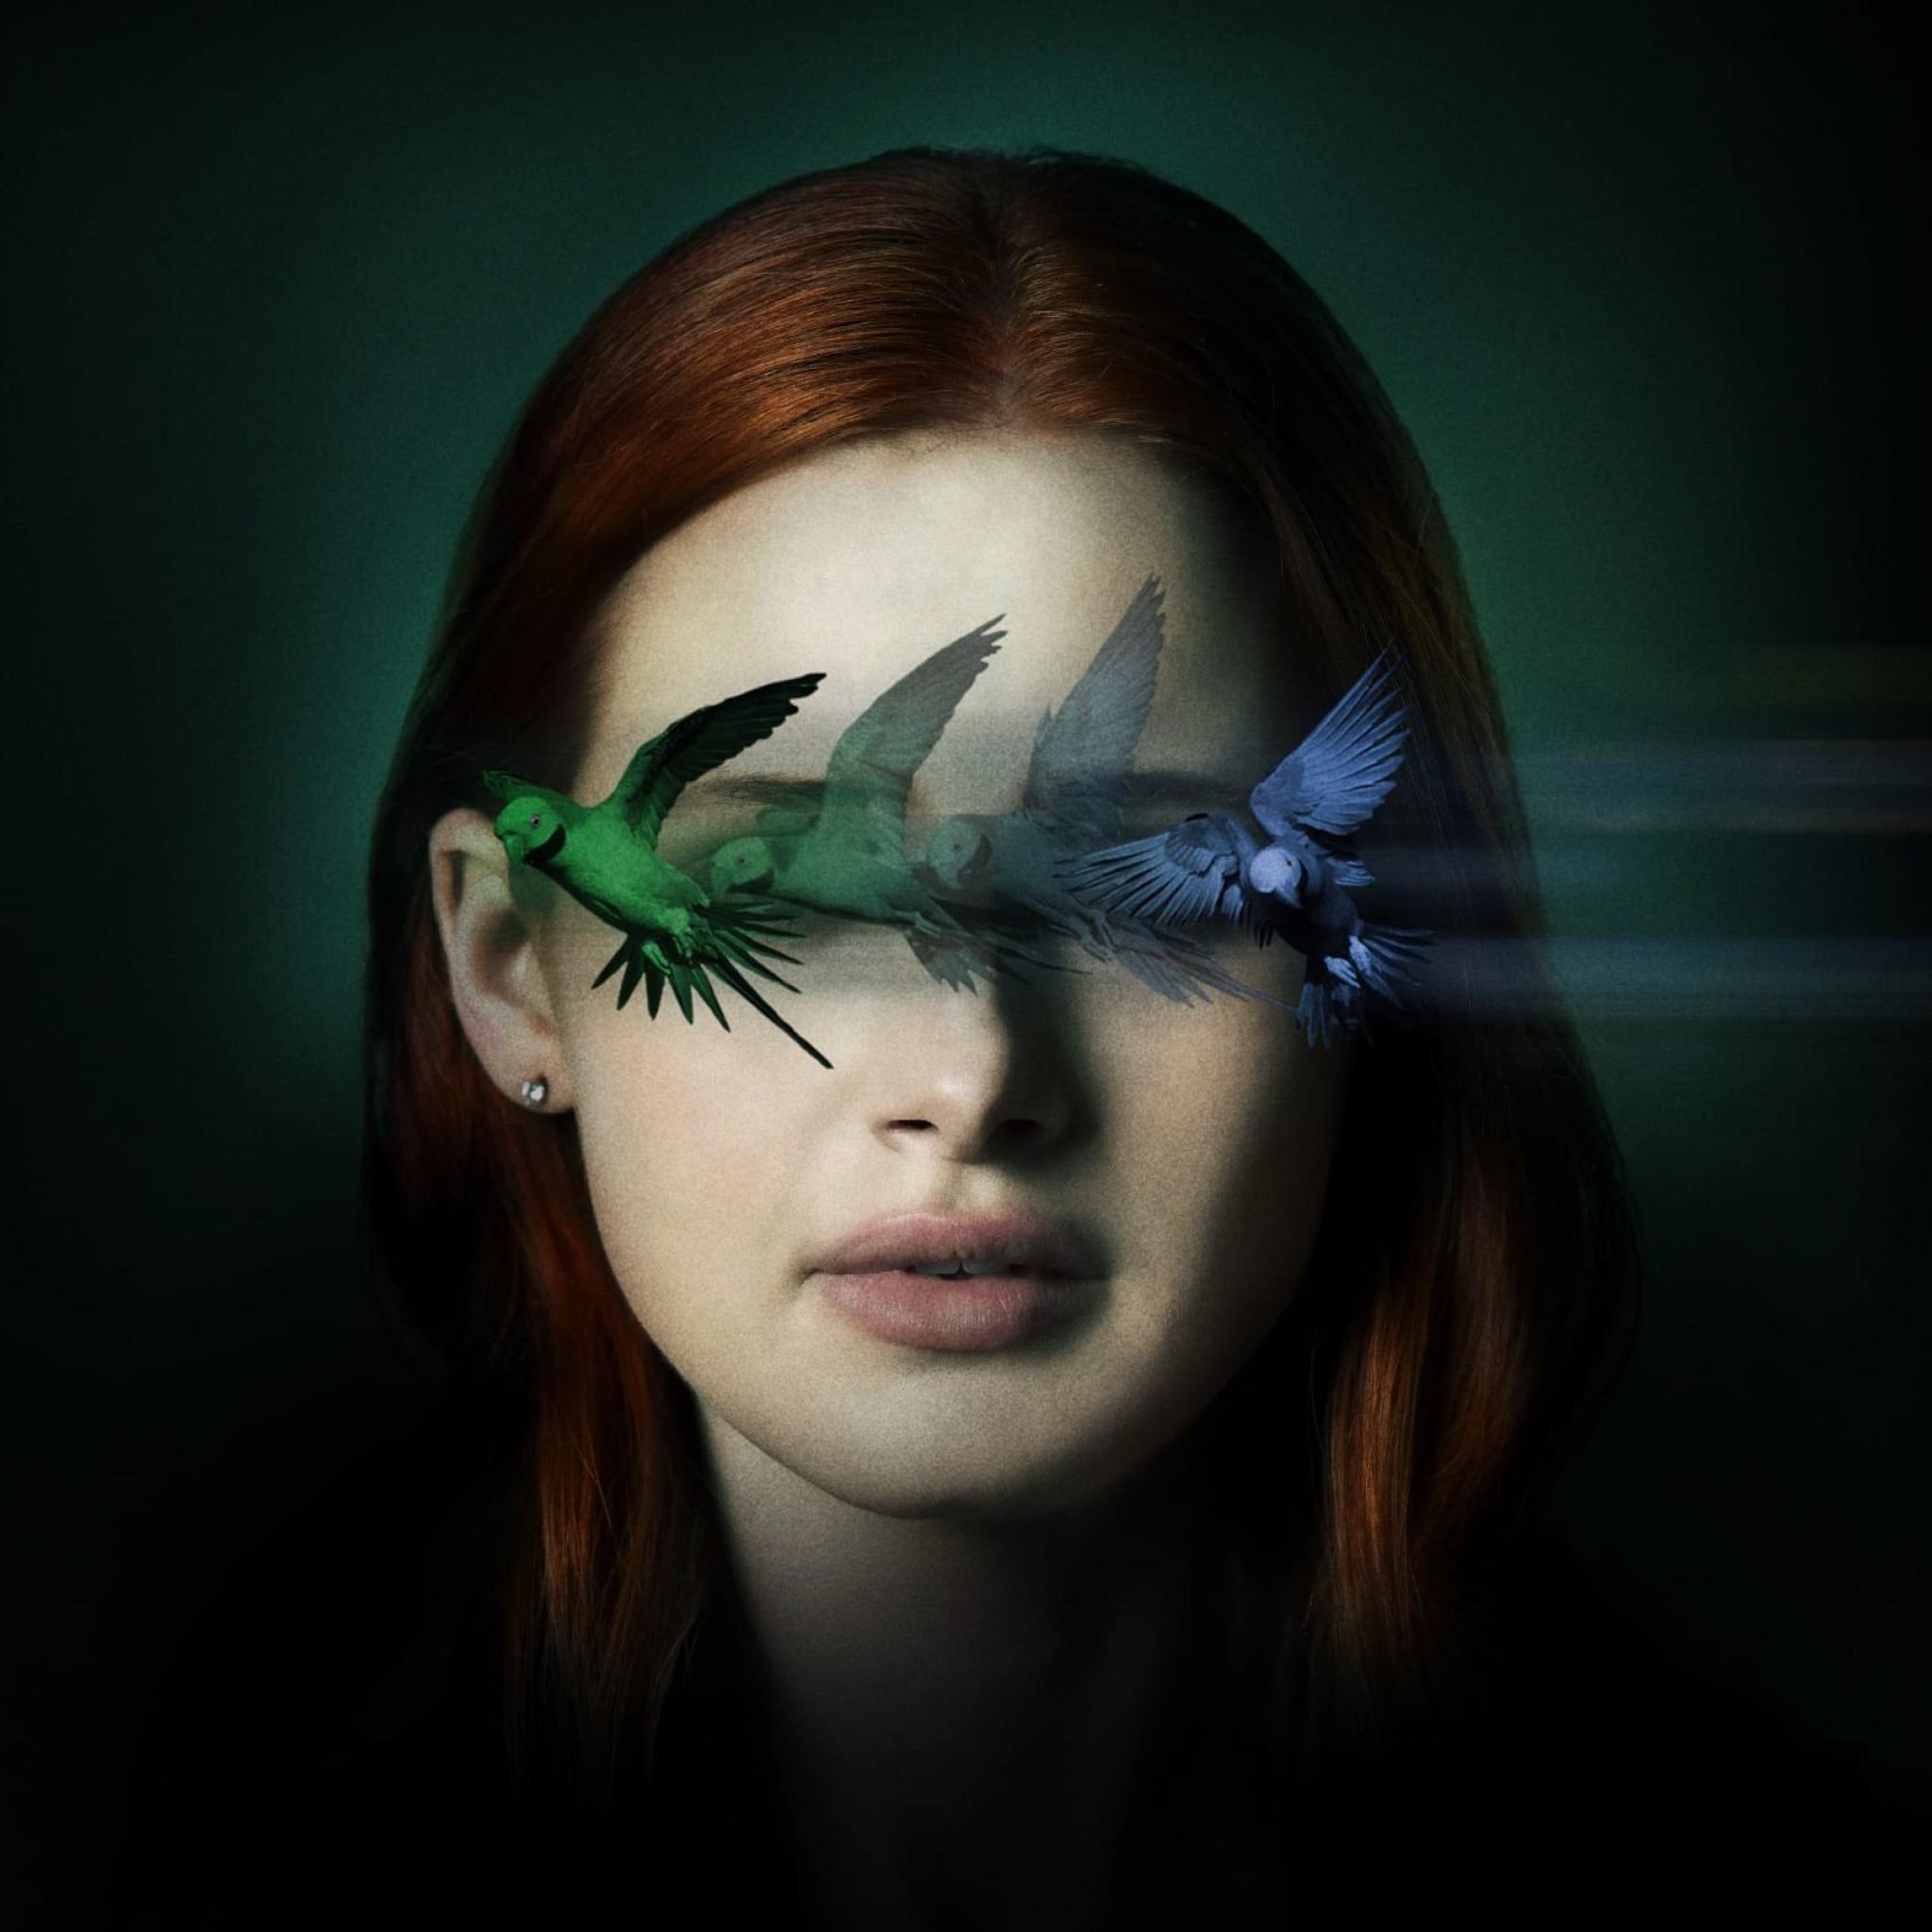 Madelaine Petsch Sightless Movie Wallpaper in 2048x2048 Resolution